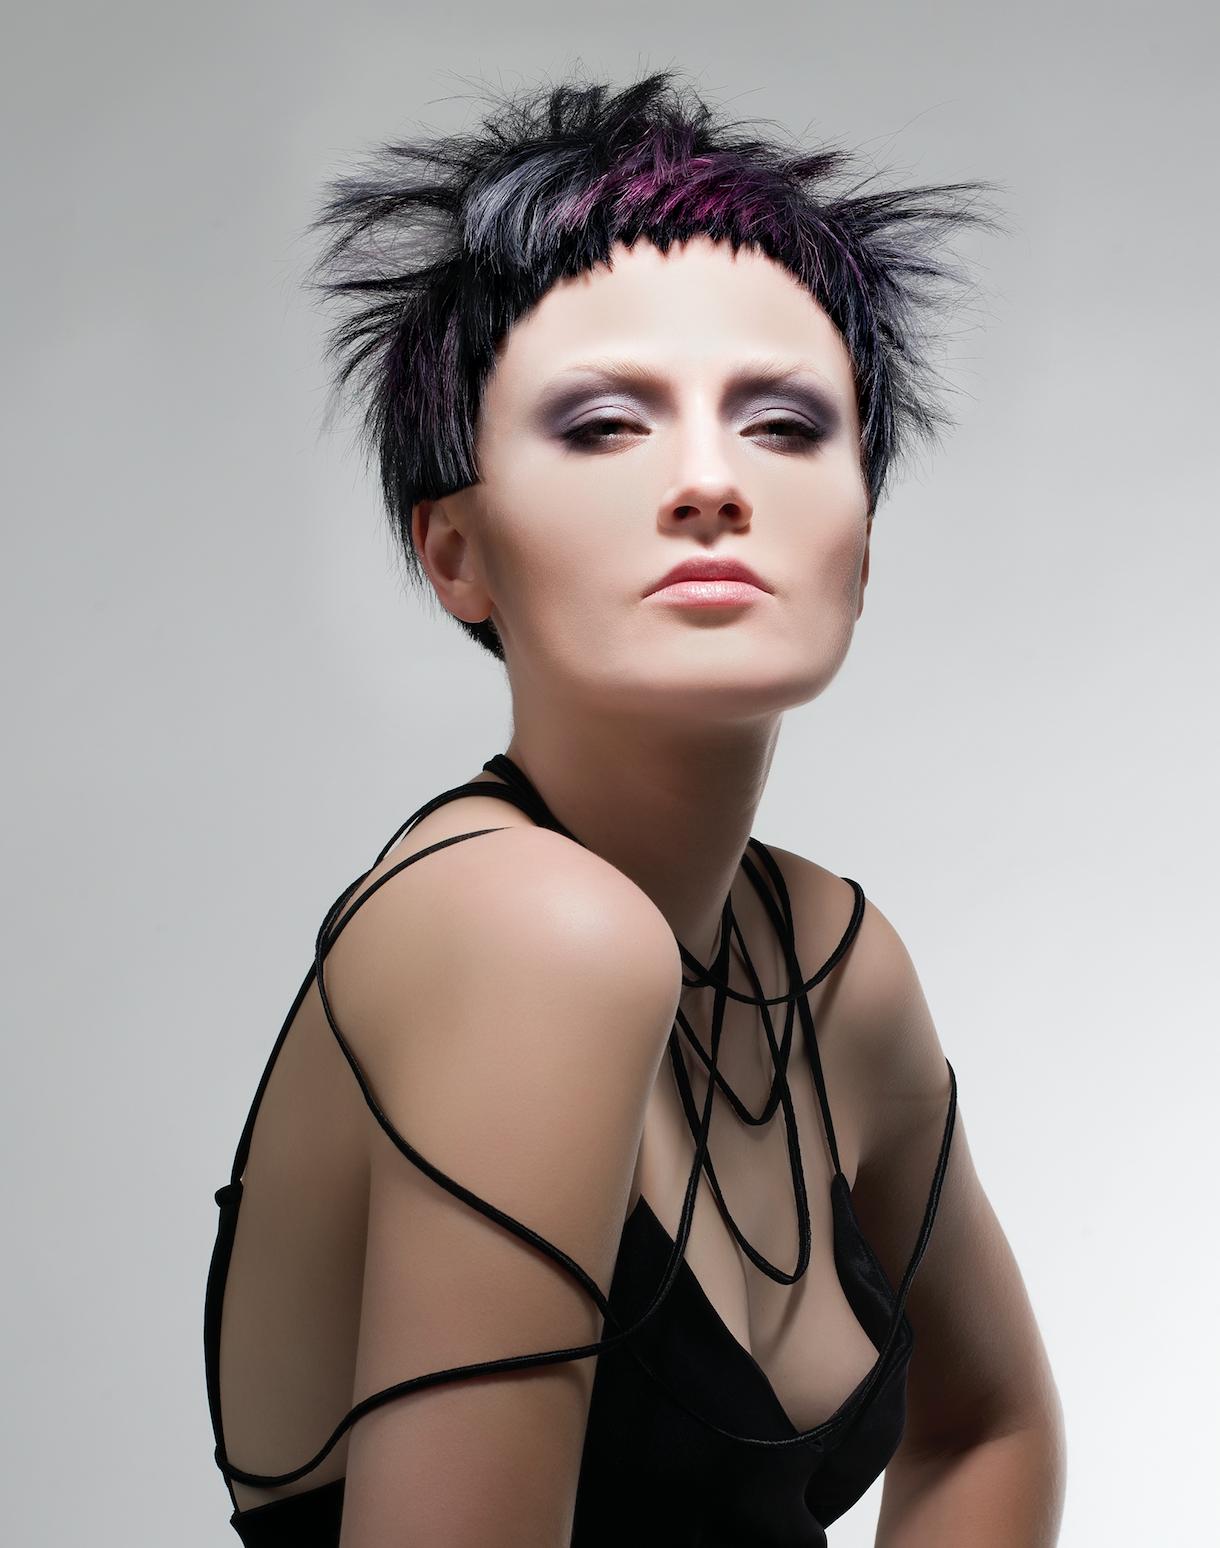 Color -  Lupe Voss  Art Direction -  Allen Ruiz  Cut -  Geno Chapman  Make-Up - Anastasia Durasova  Photo -  Manuel Voss